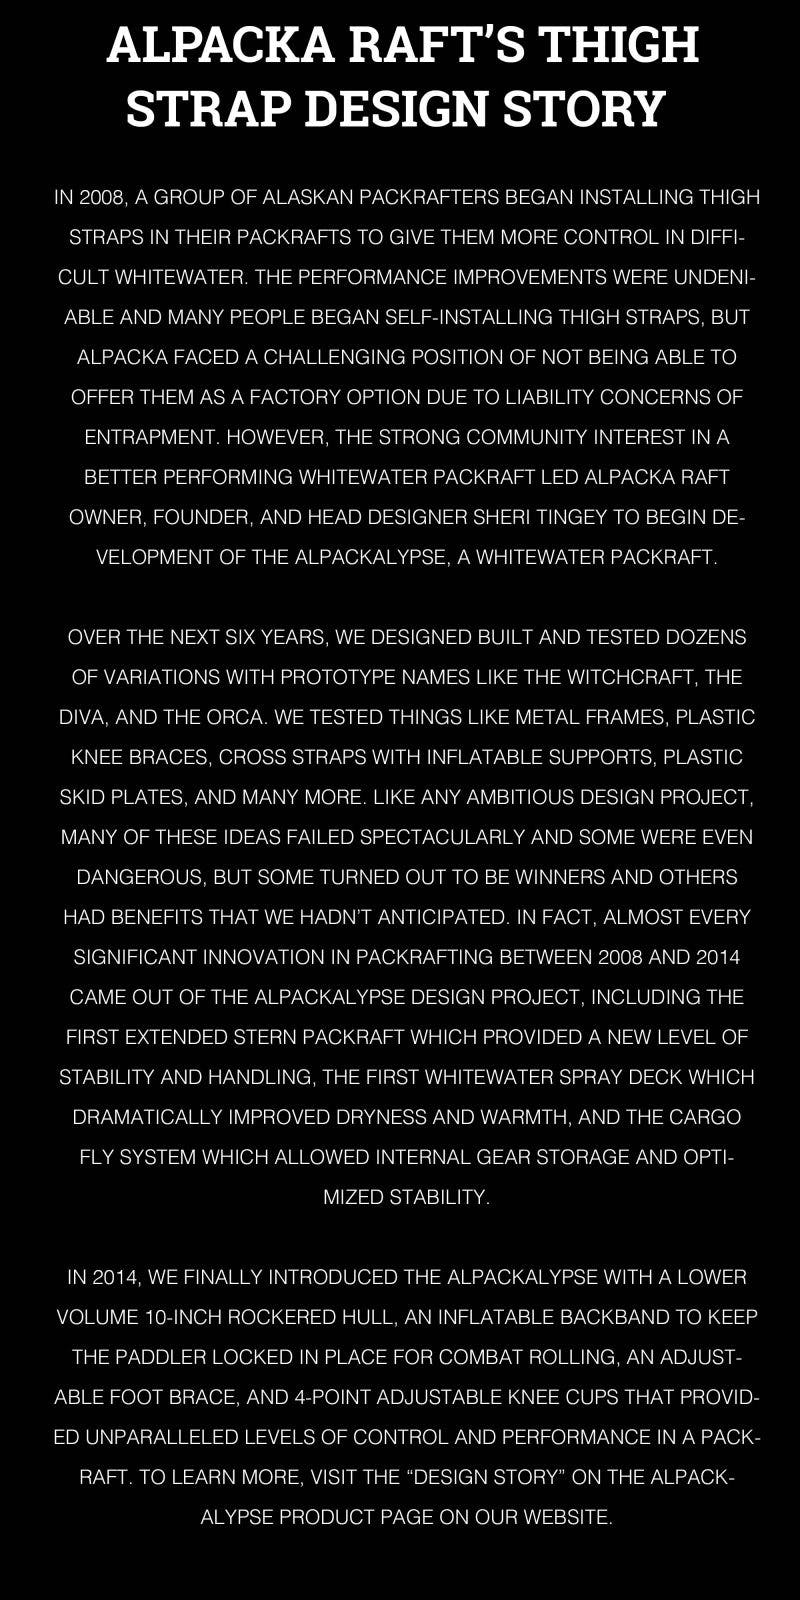 Alpacka Raft's thigh strap design story.